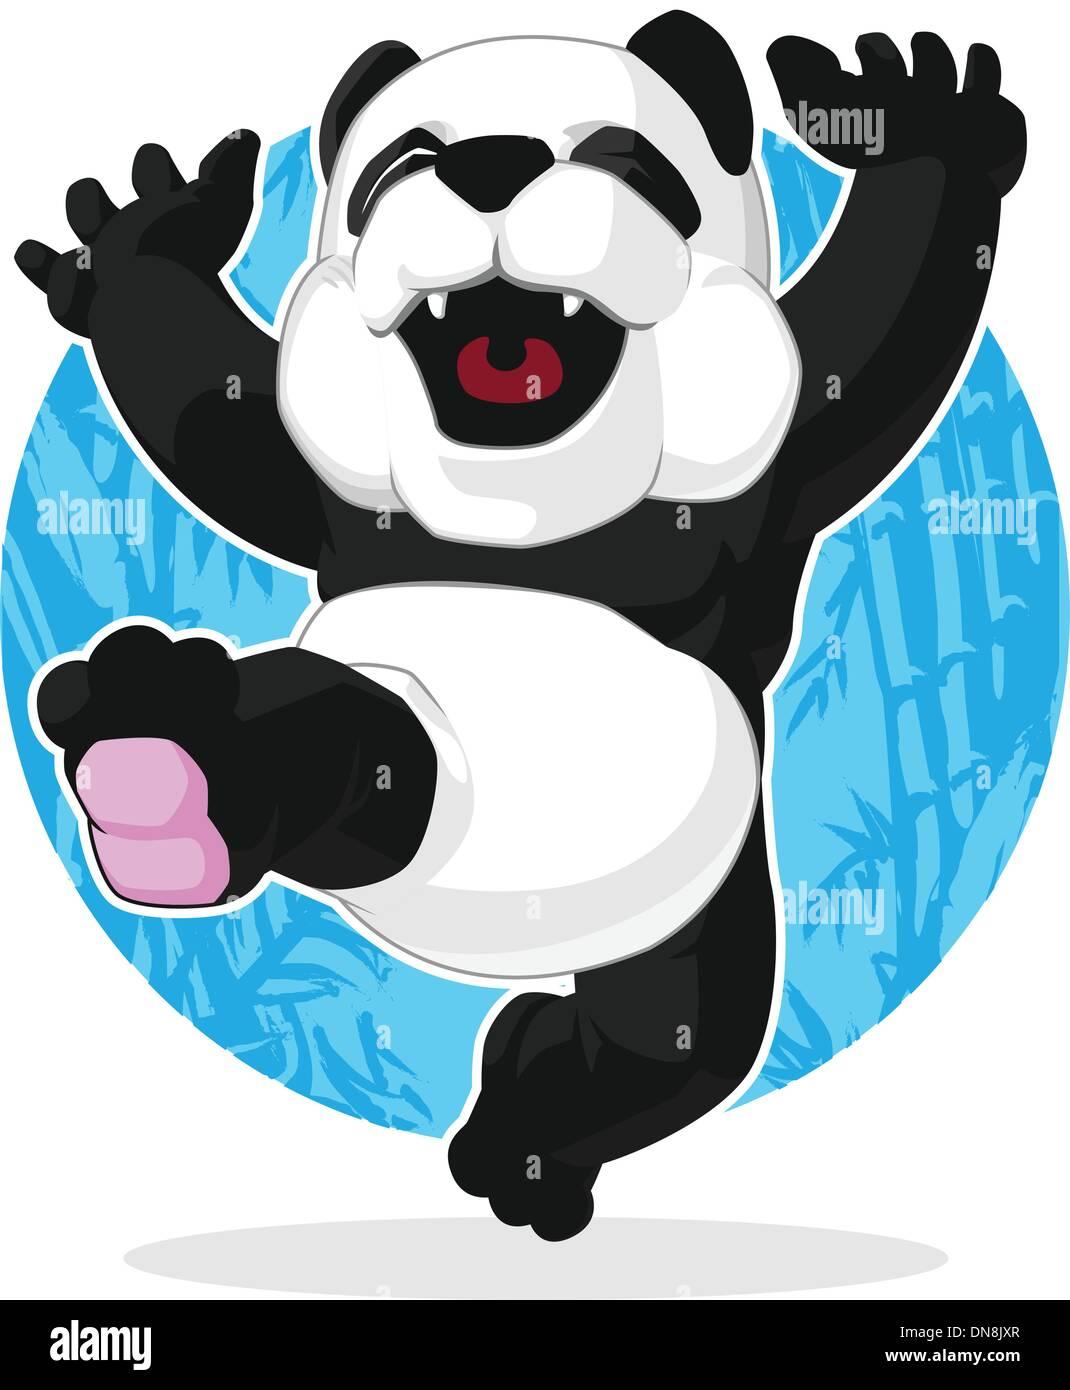 Panda Jumping in Excitement - Stock Vector